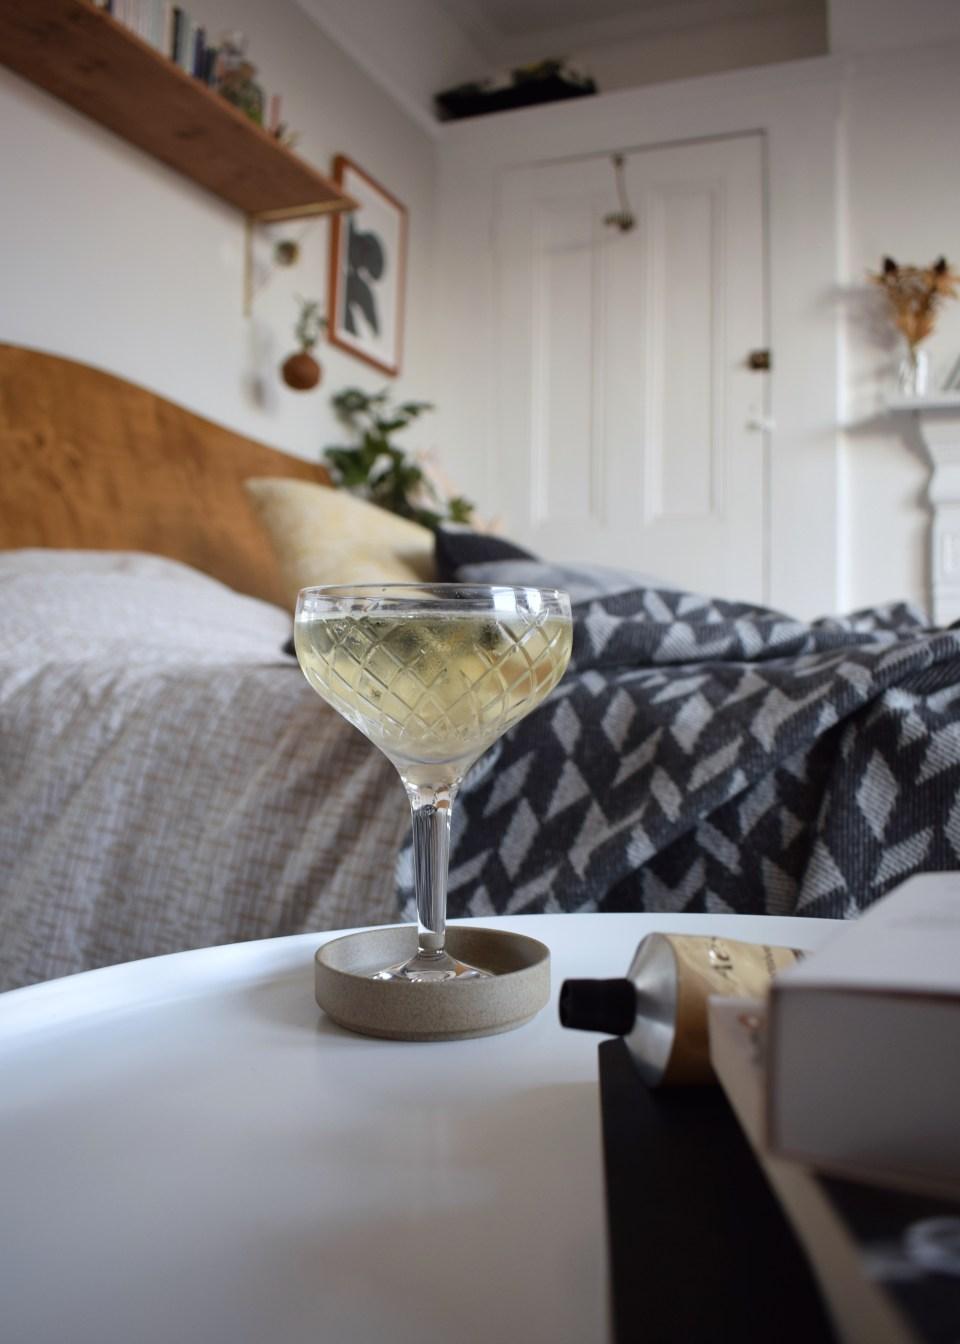 ohn Lewis Soho Home Barwell range, bohemian blue cocktail room, champagne coupee in scandinavian interior style bedroom, decor ideas (2)